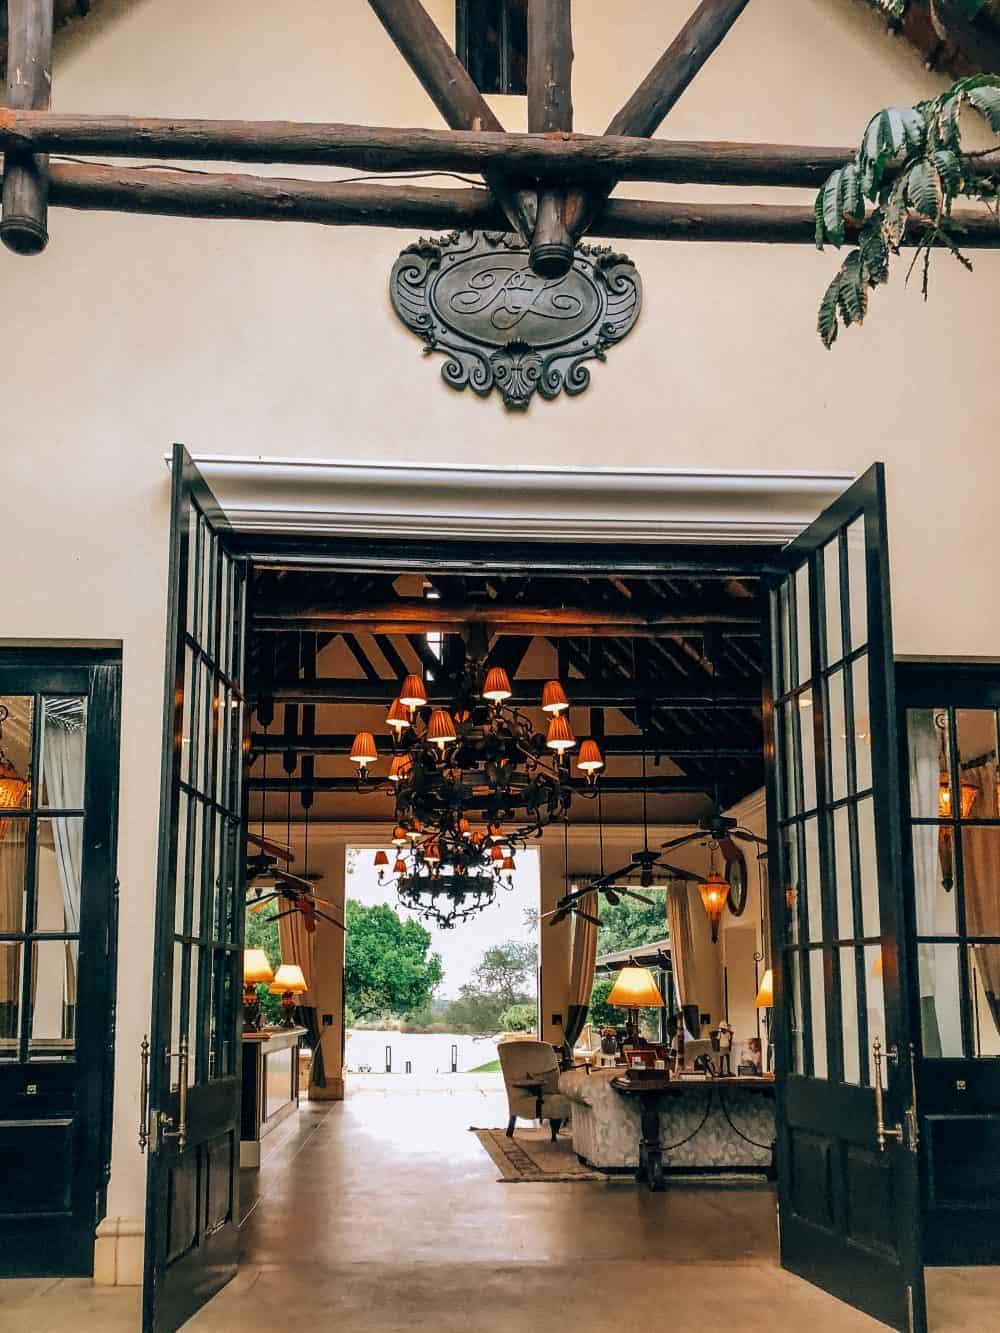 The beautiful Royal Livingstone Hotel in Zambia